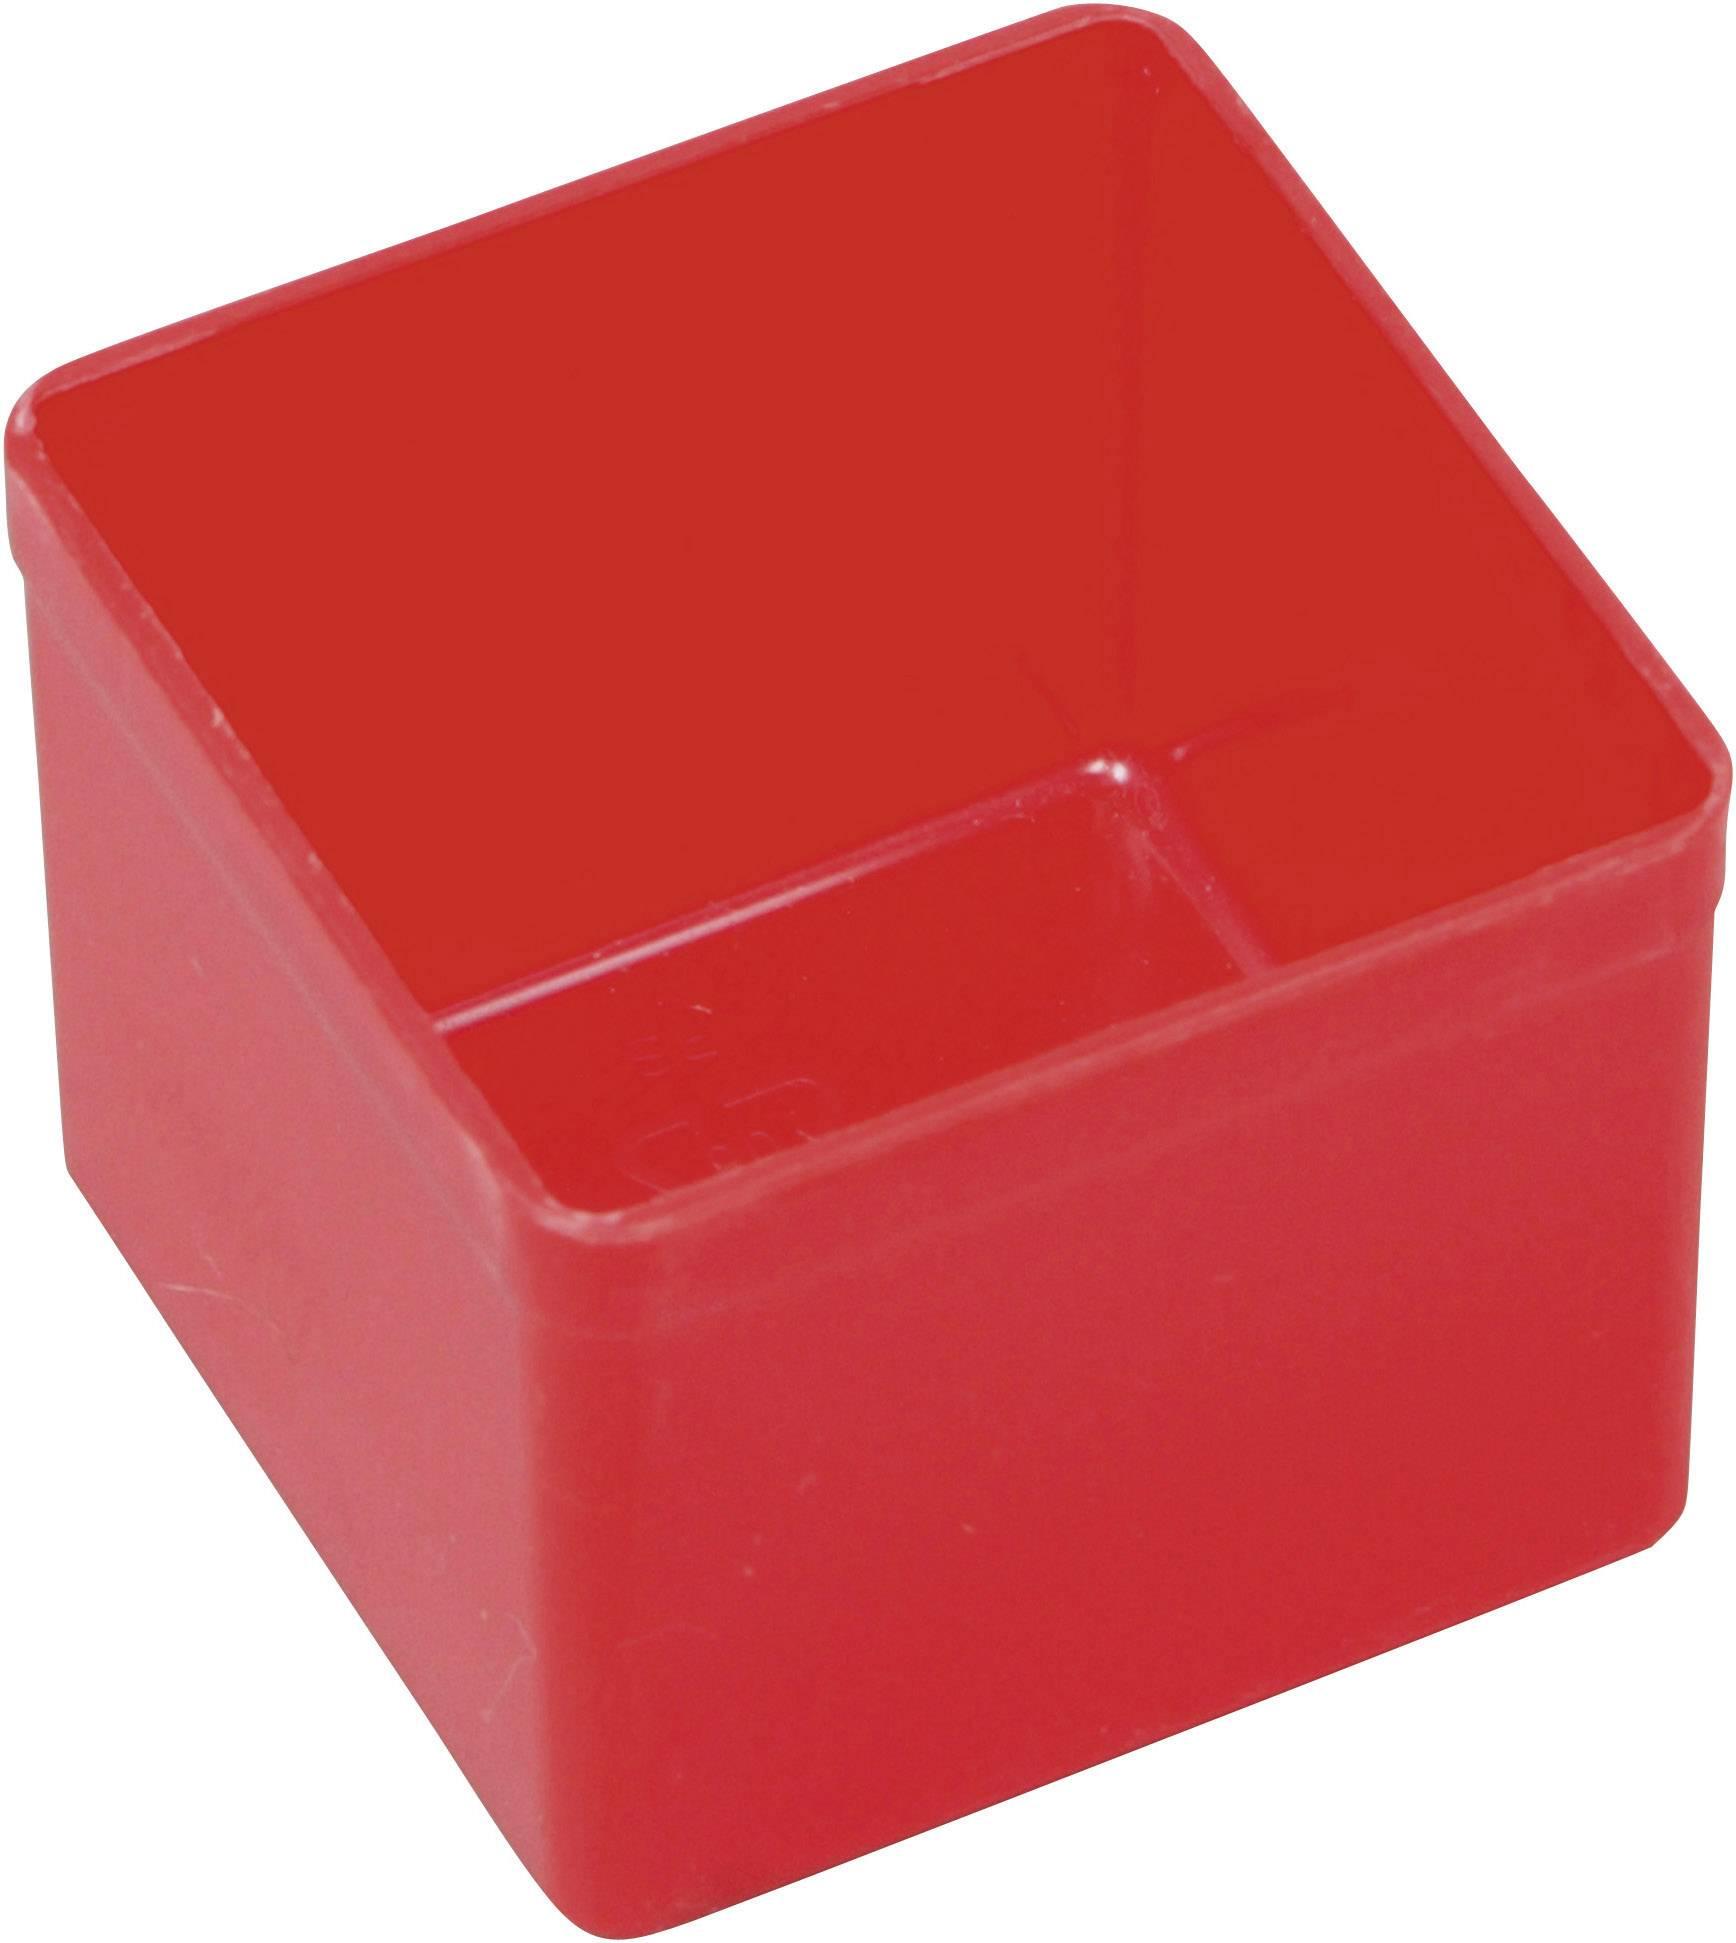 Allit 456300, 54 x 54 x 45 , červená